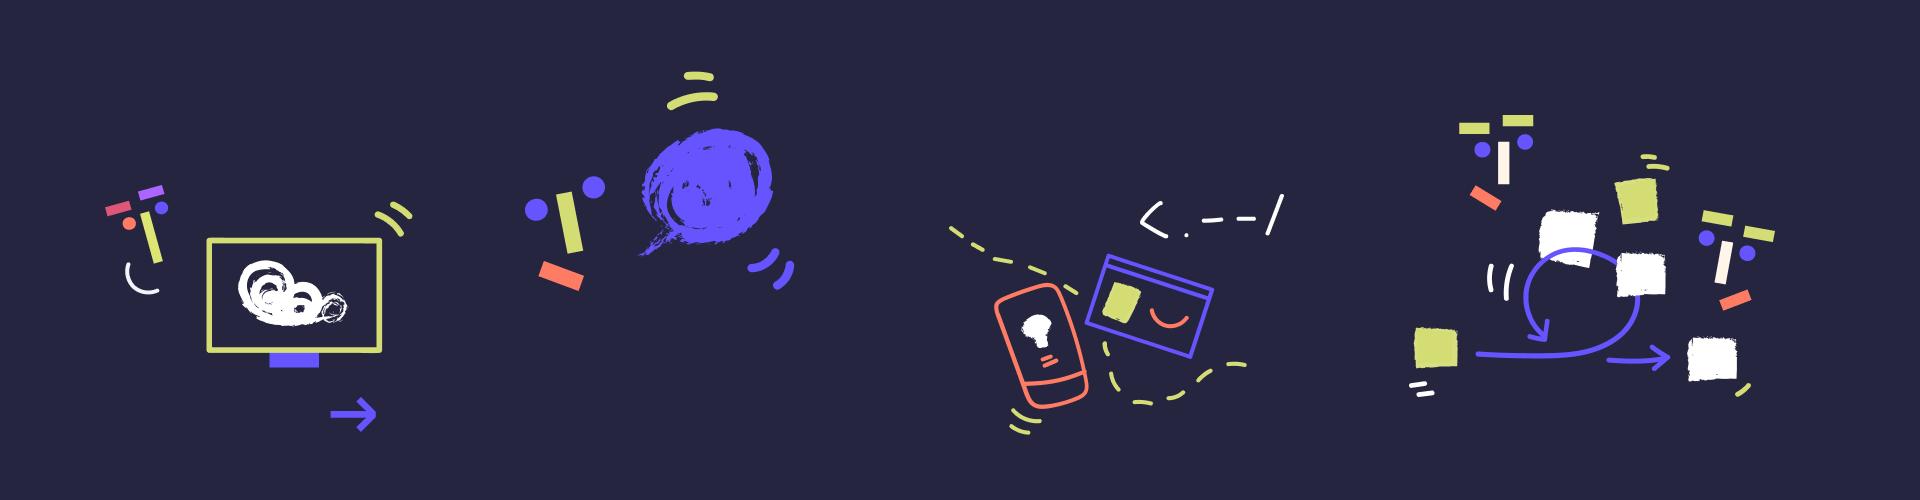 Bility-illustration-tech